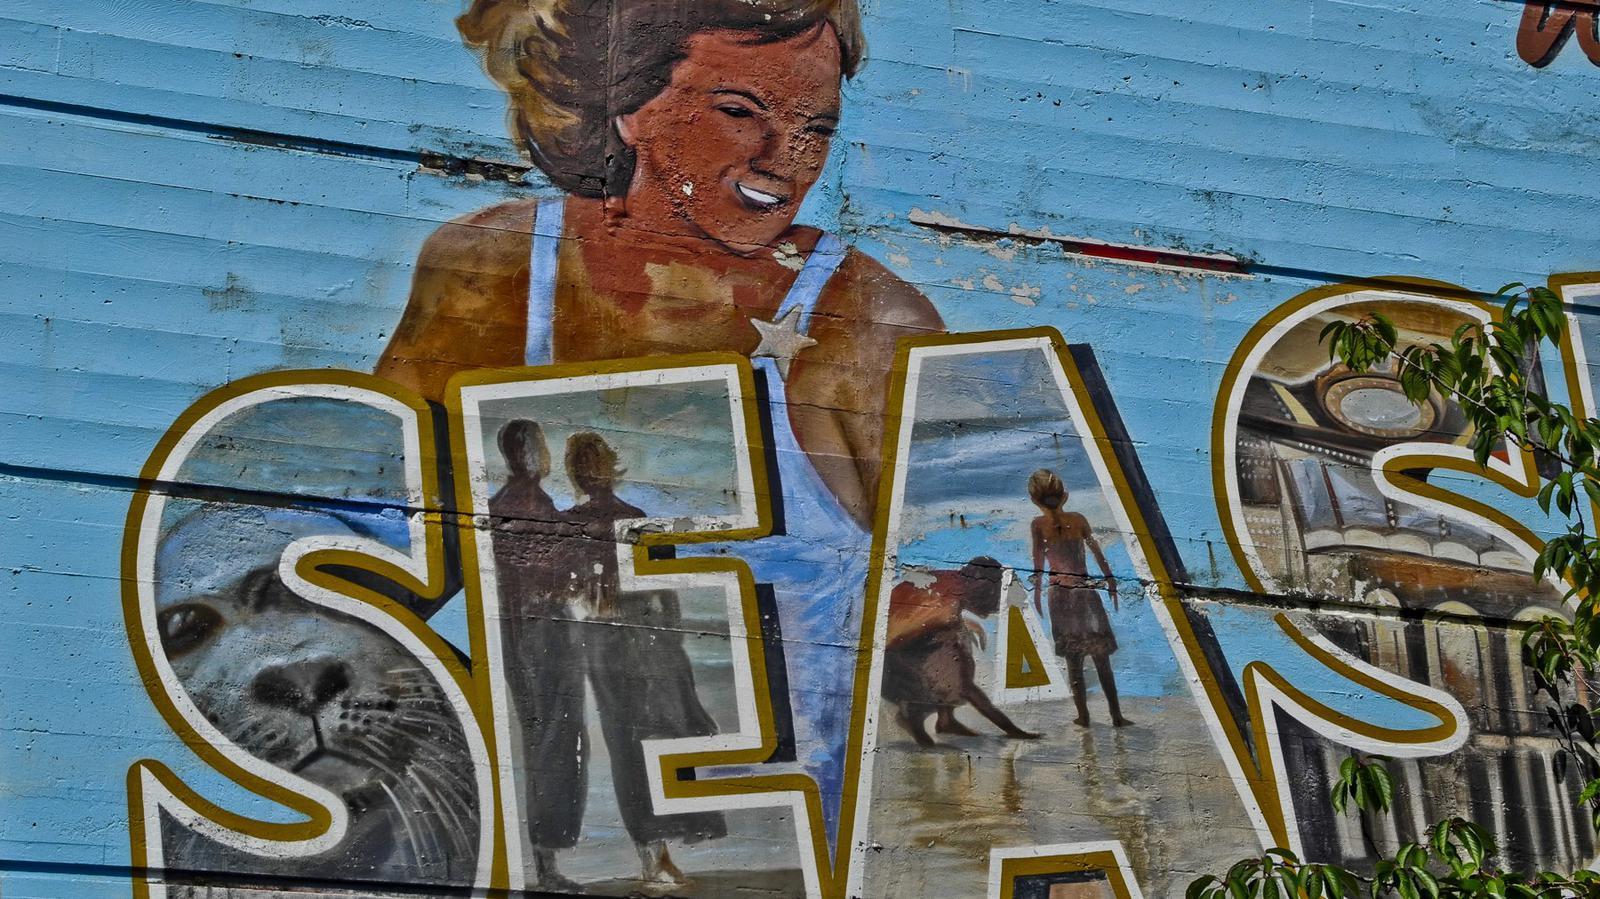 Seaside OR- Photo Credit- Flickr-Rick Mickelson